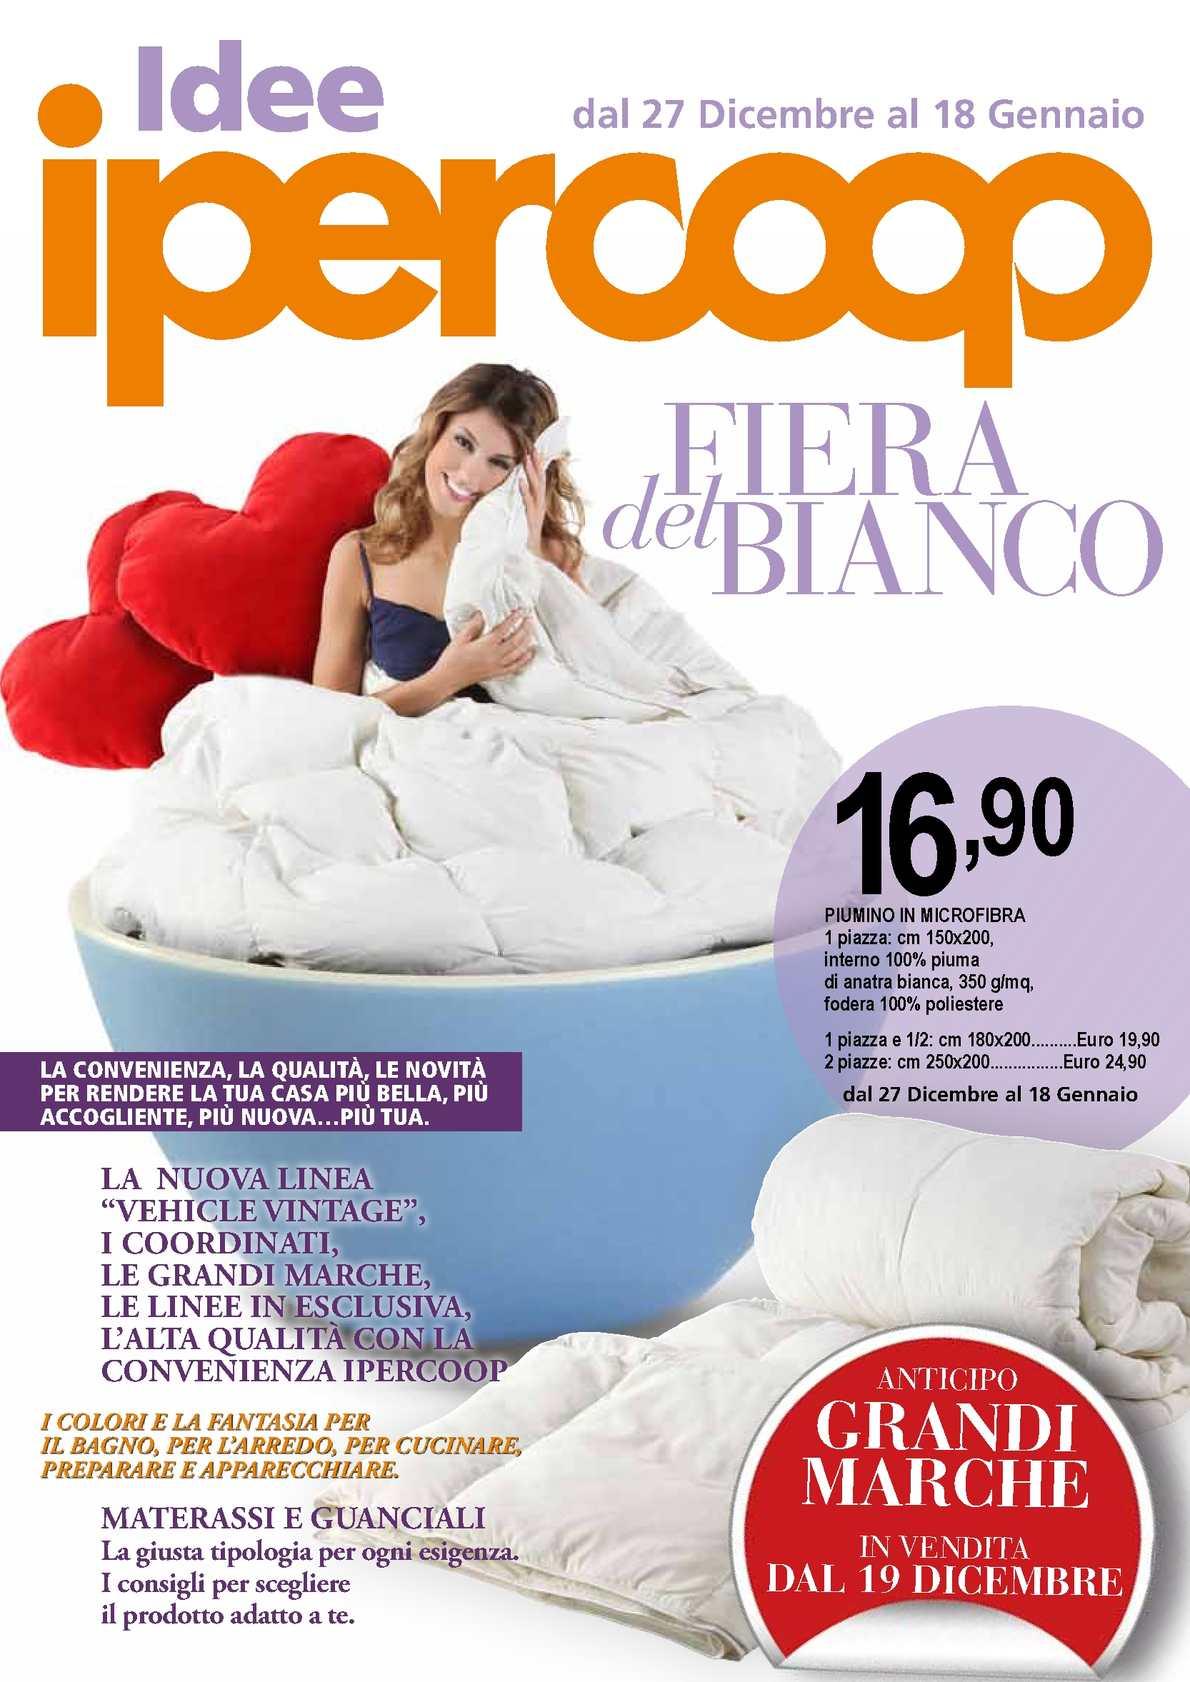 Materasso Memory Offerta Coop.Calameo Offerte Ipercoop Sandona Di Piave Fiera Del Bianco 12 2011